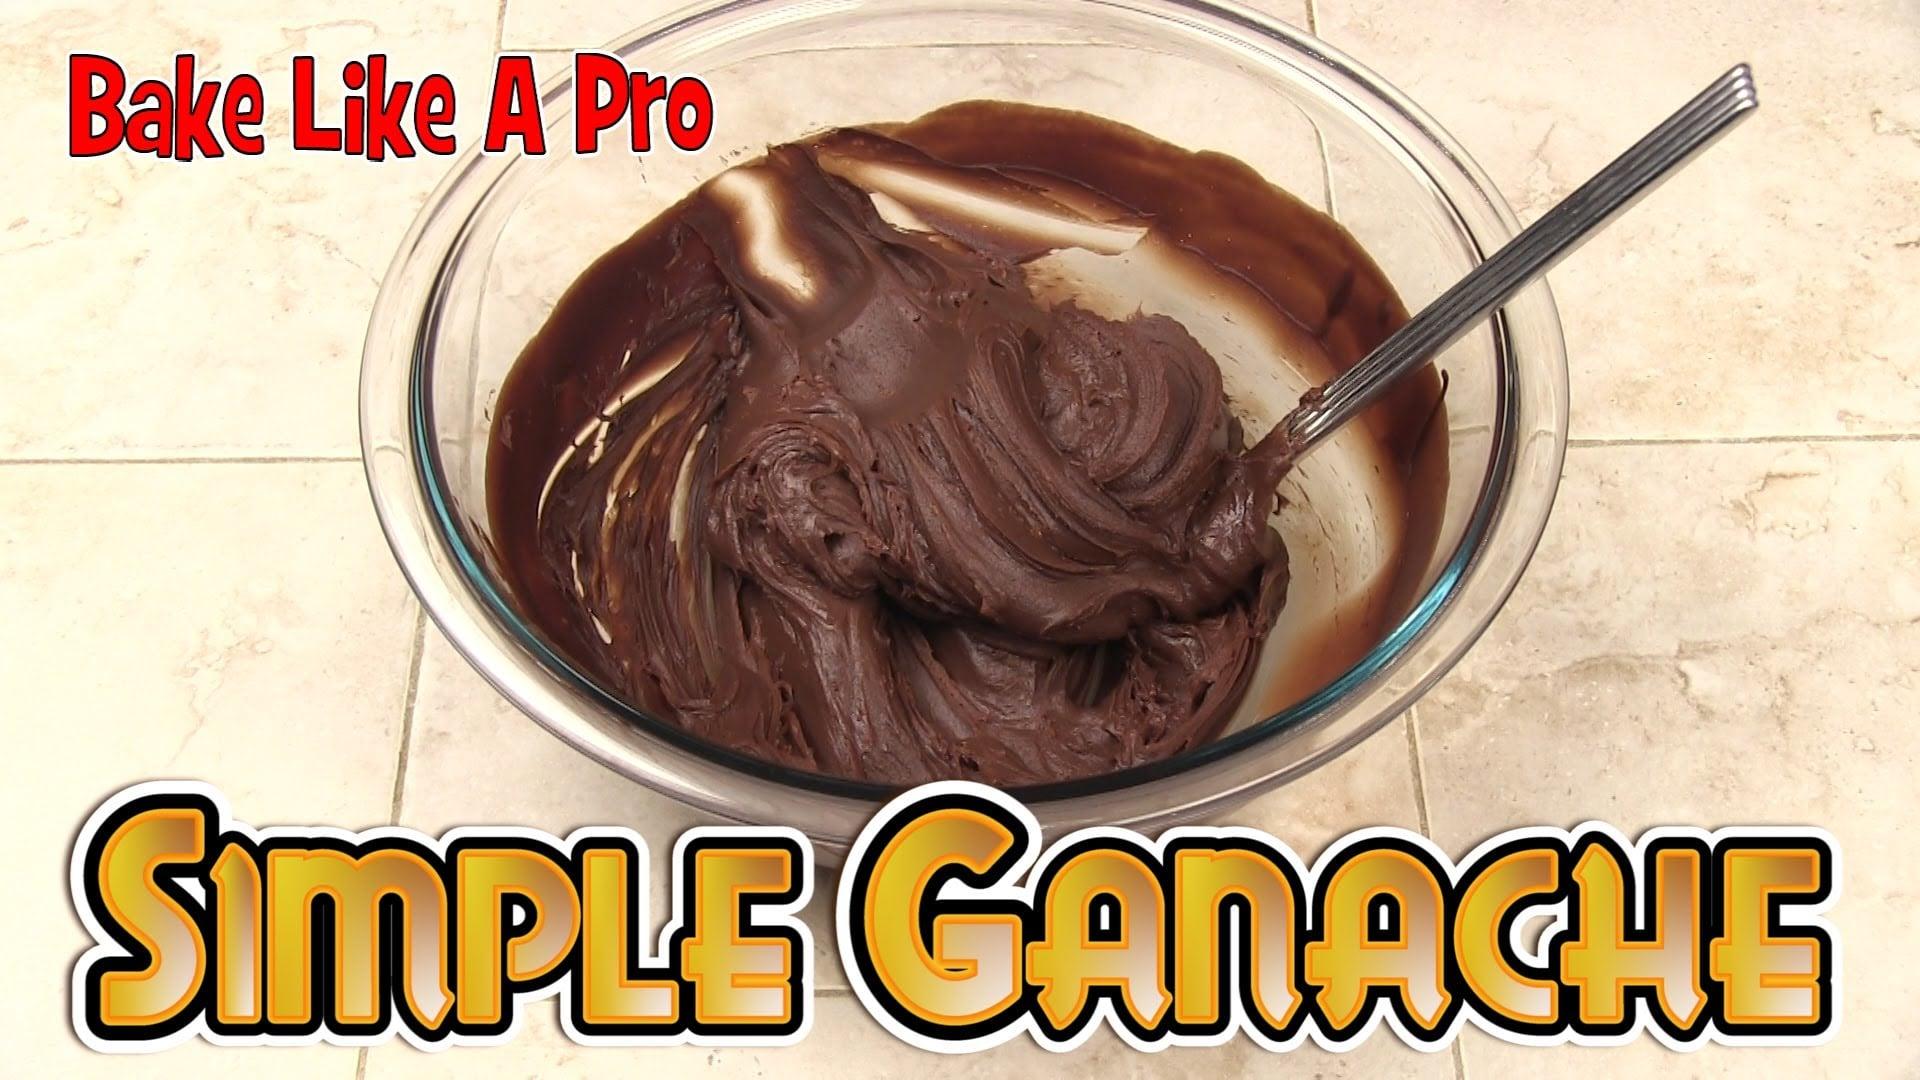 Simple Chocolate Ganache Recipe ! –  Chocolate & Cream Frosting / Filling